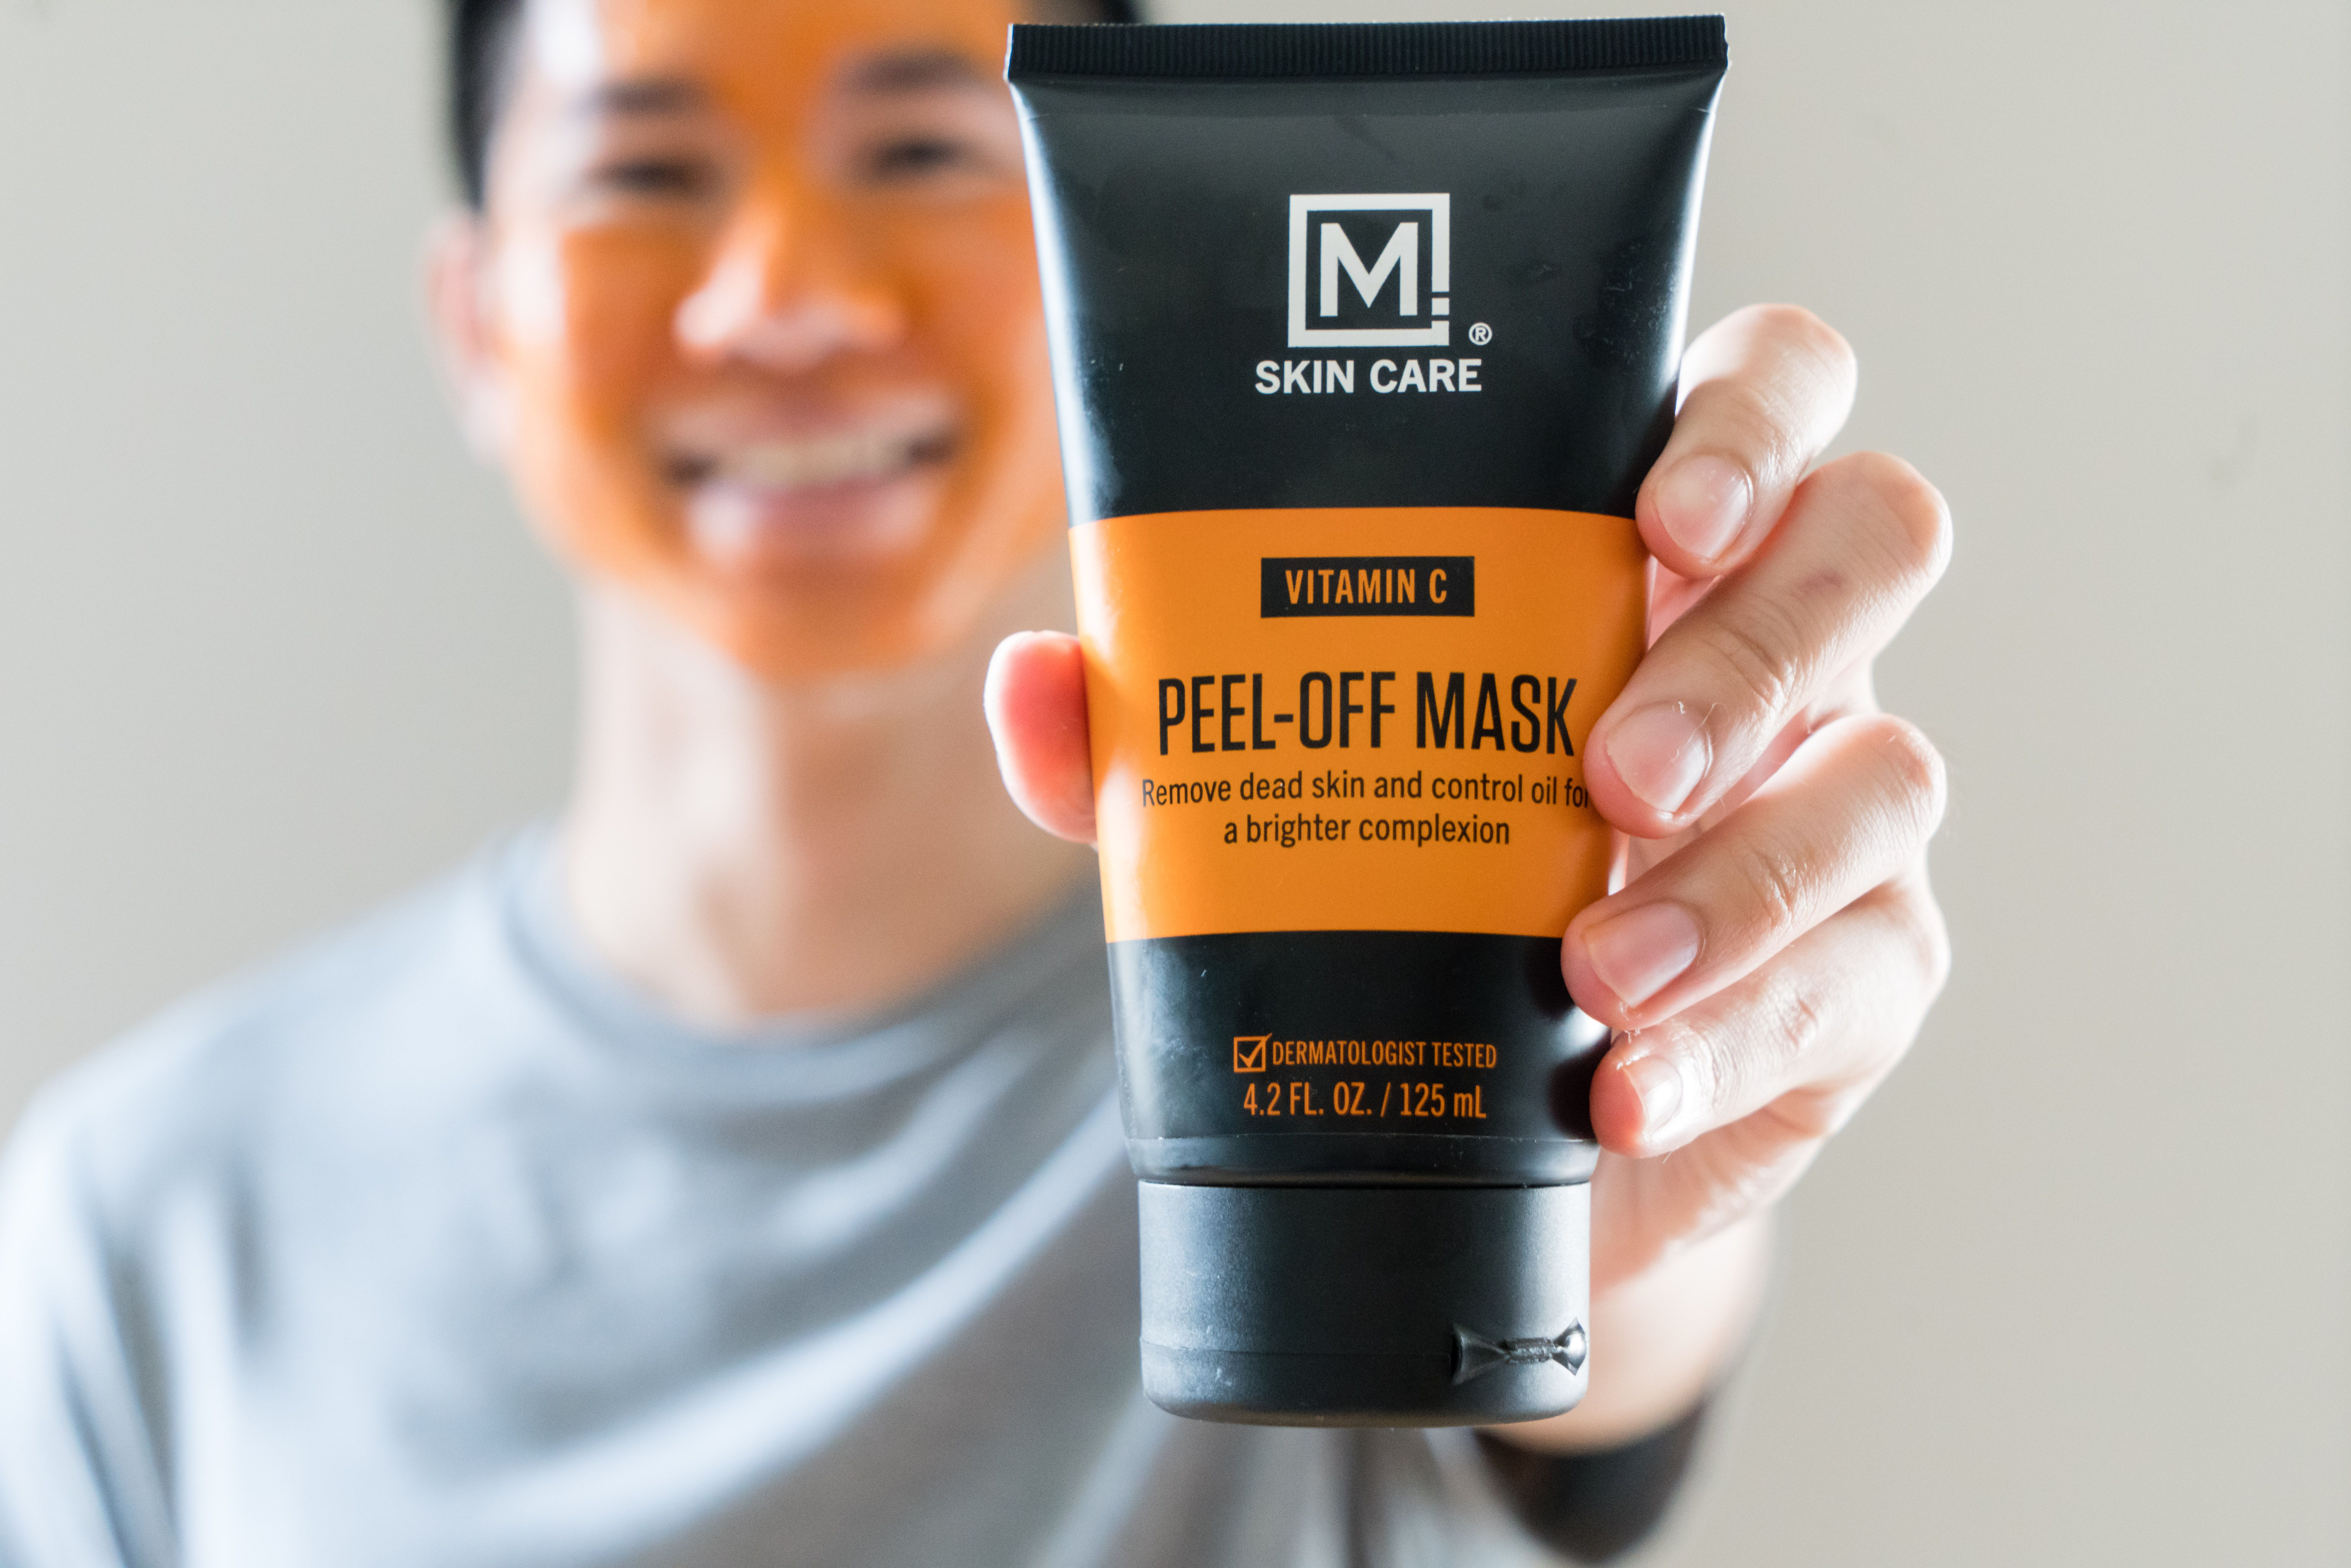 M Skin Care Vitamin C Peel Off Mask In 2020 Peel Off Mask Homemade Face Masks Skin Care